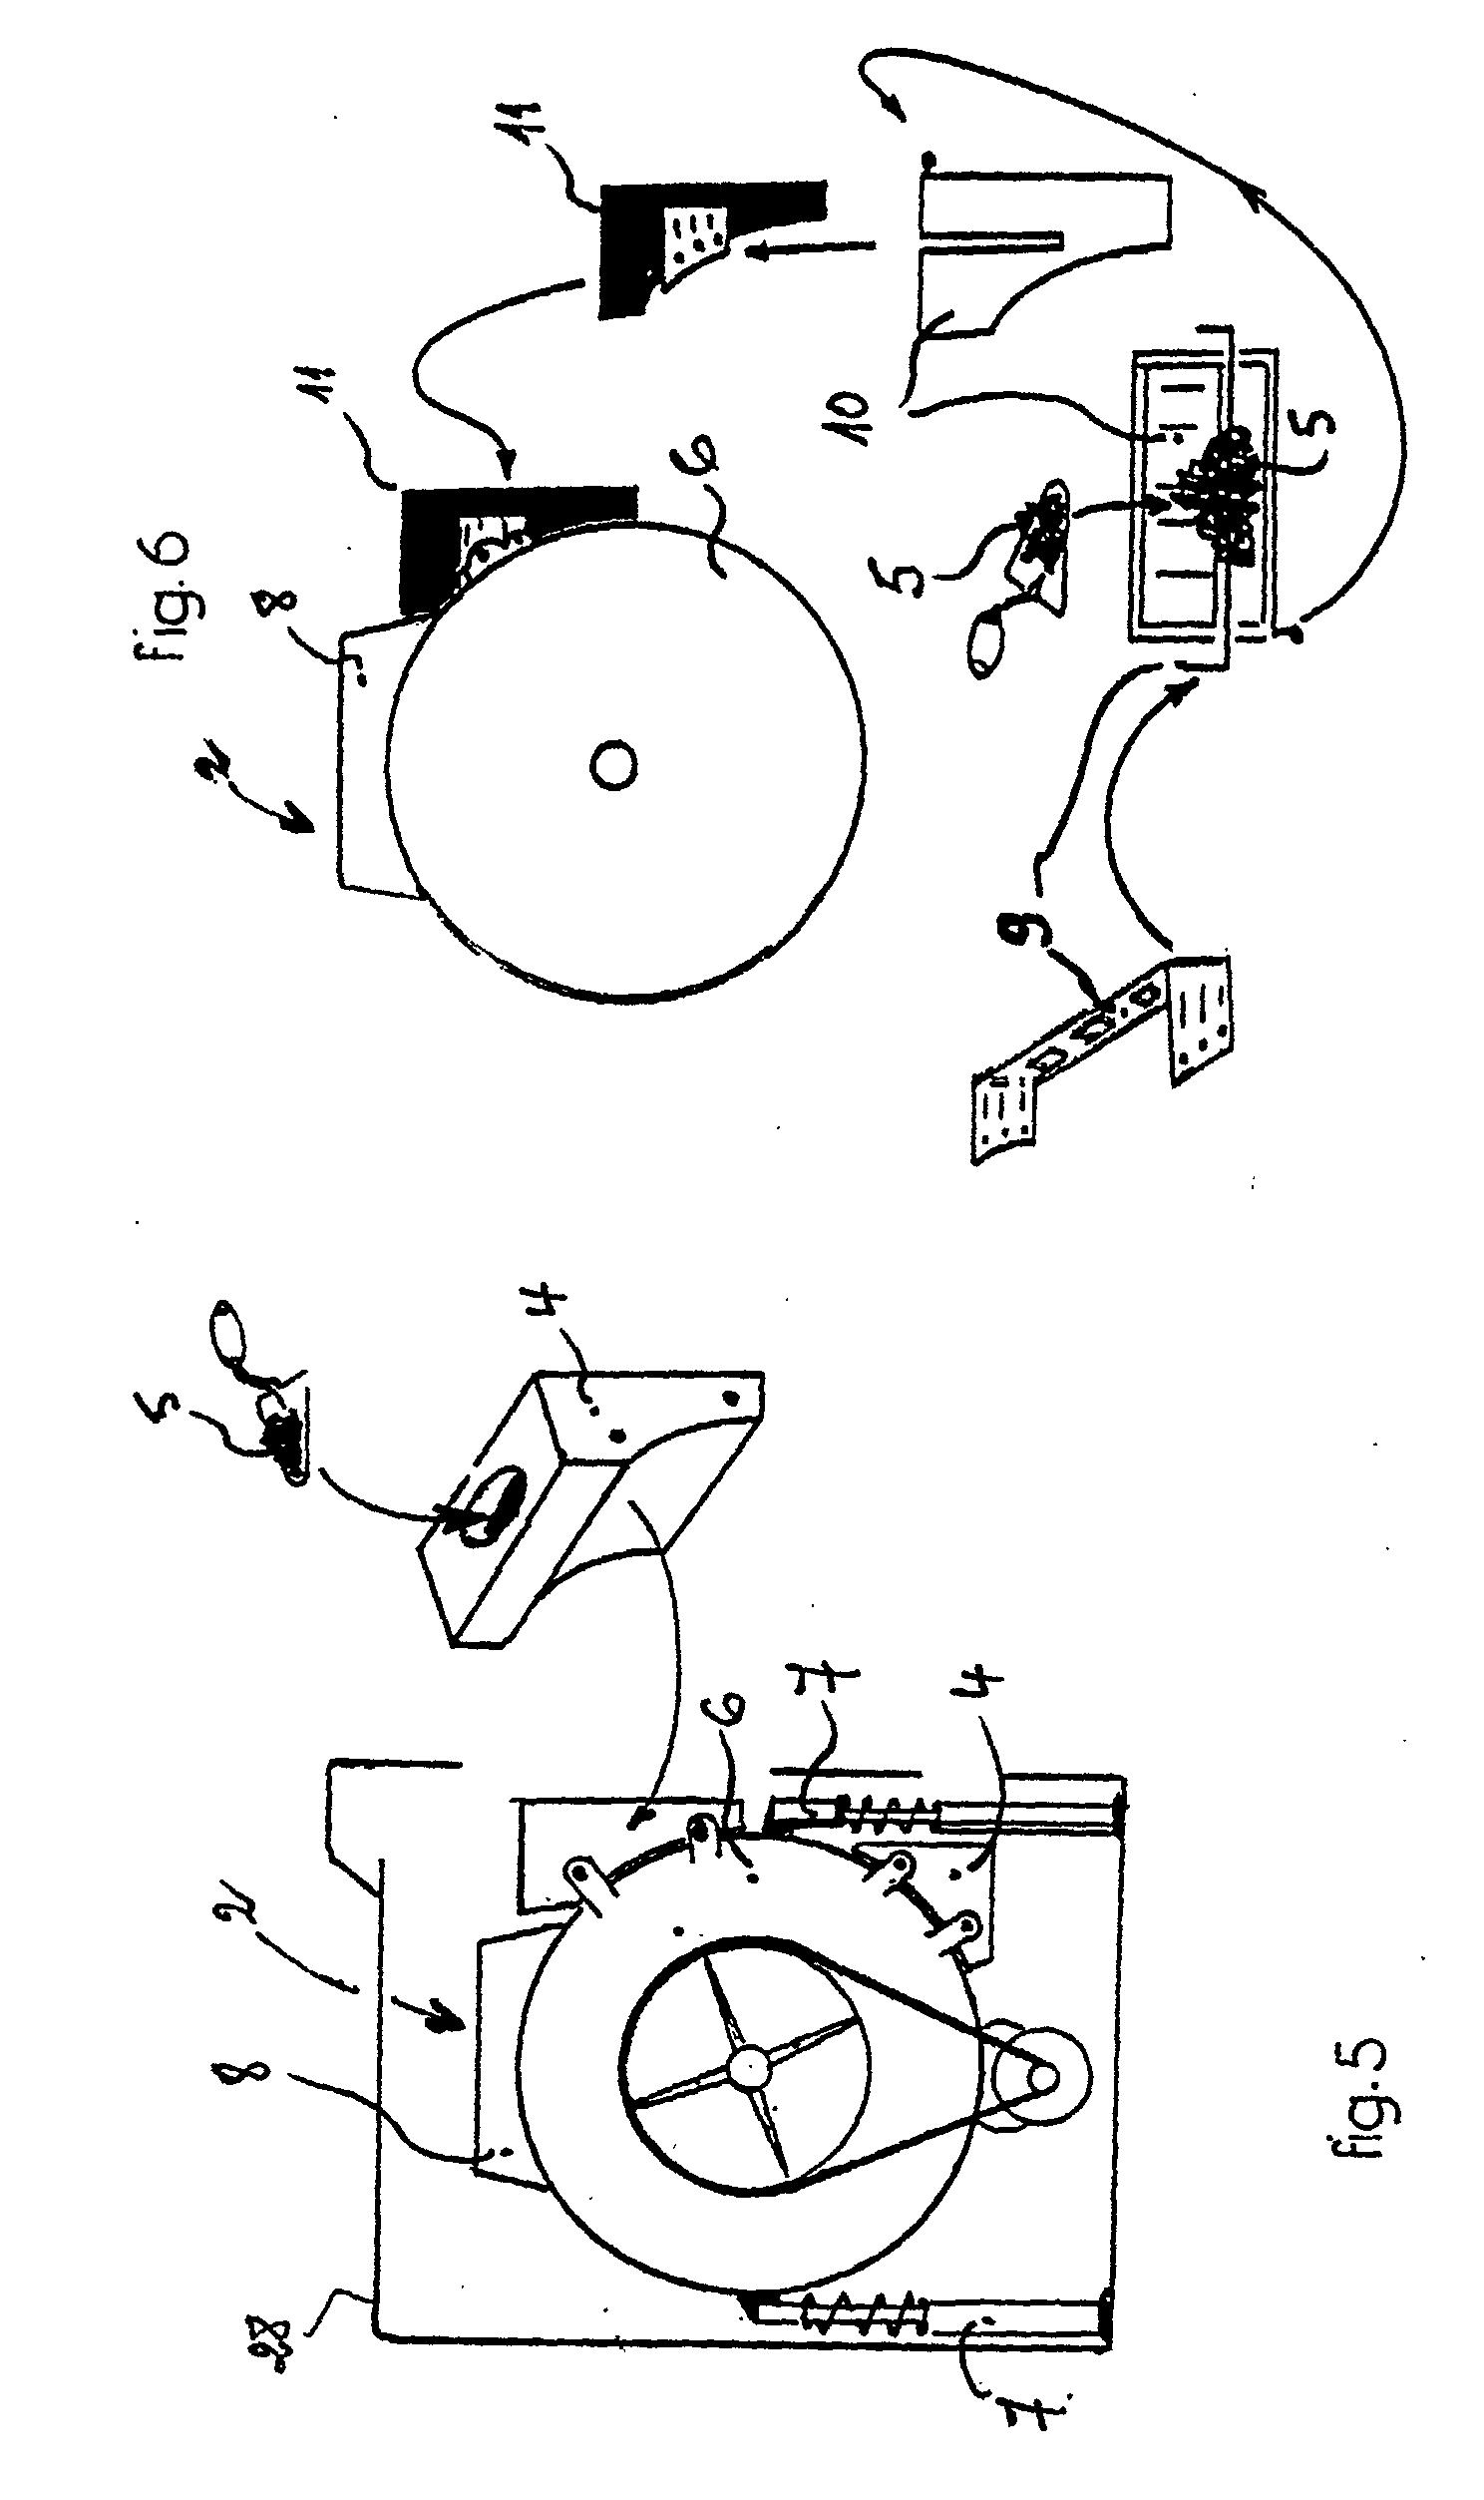 Amortisseur machine laver - Bruit machine a laver ...